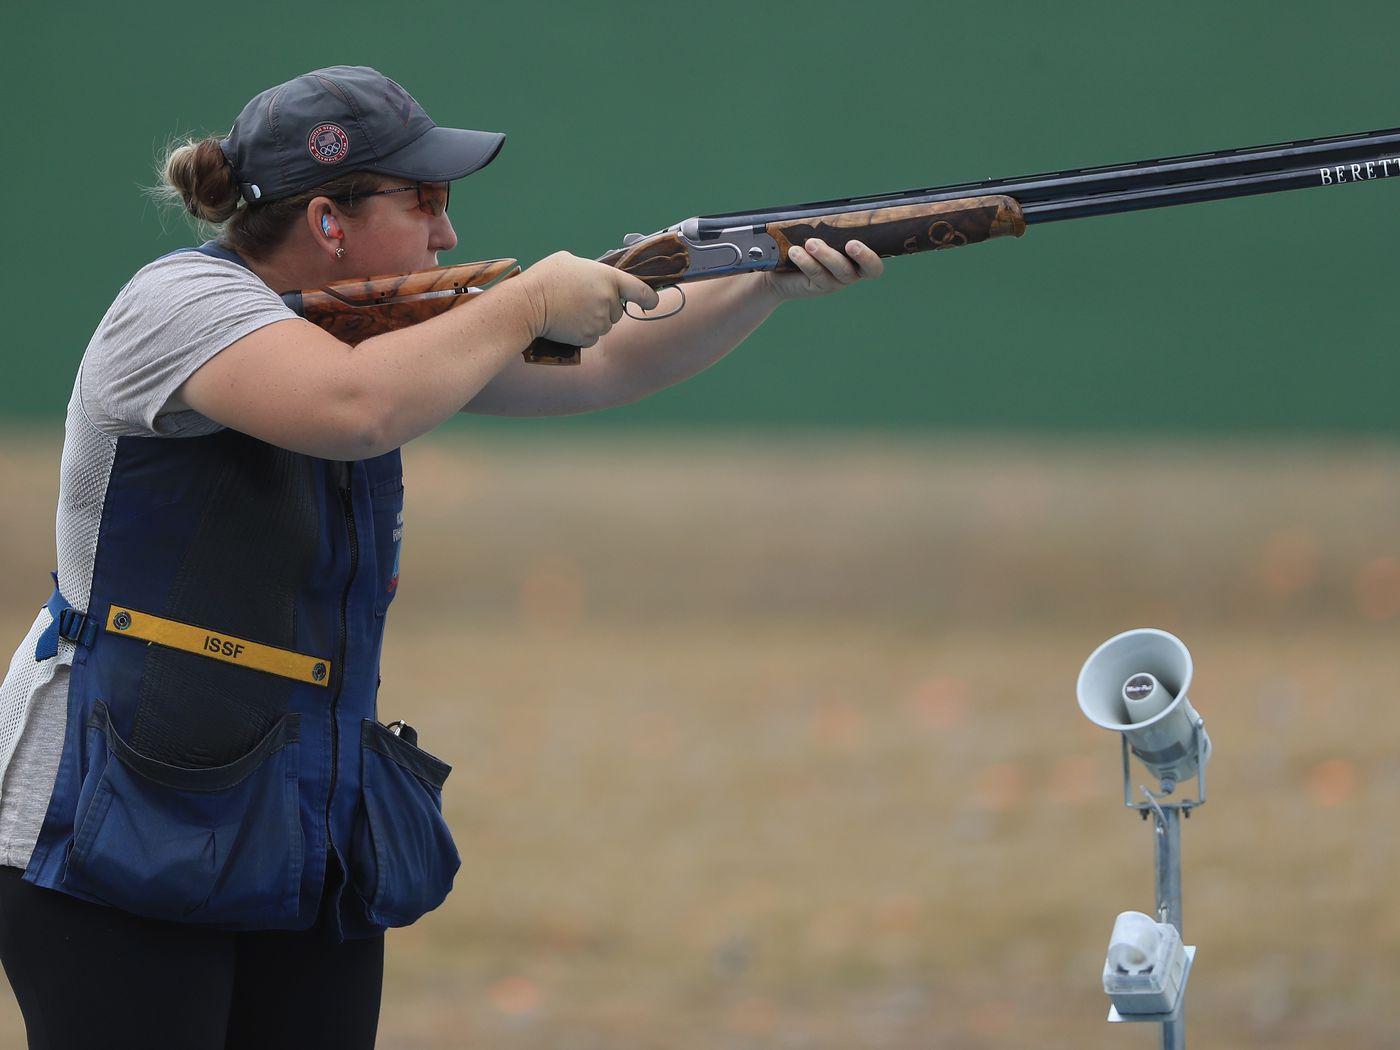 Olympic Shooting 2016 Kim Rhode Wins Bronze In Womens